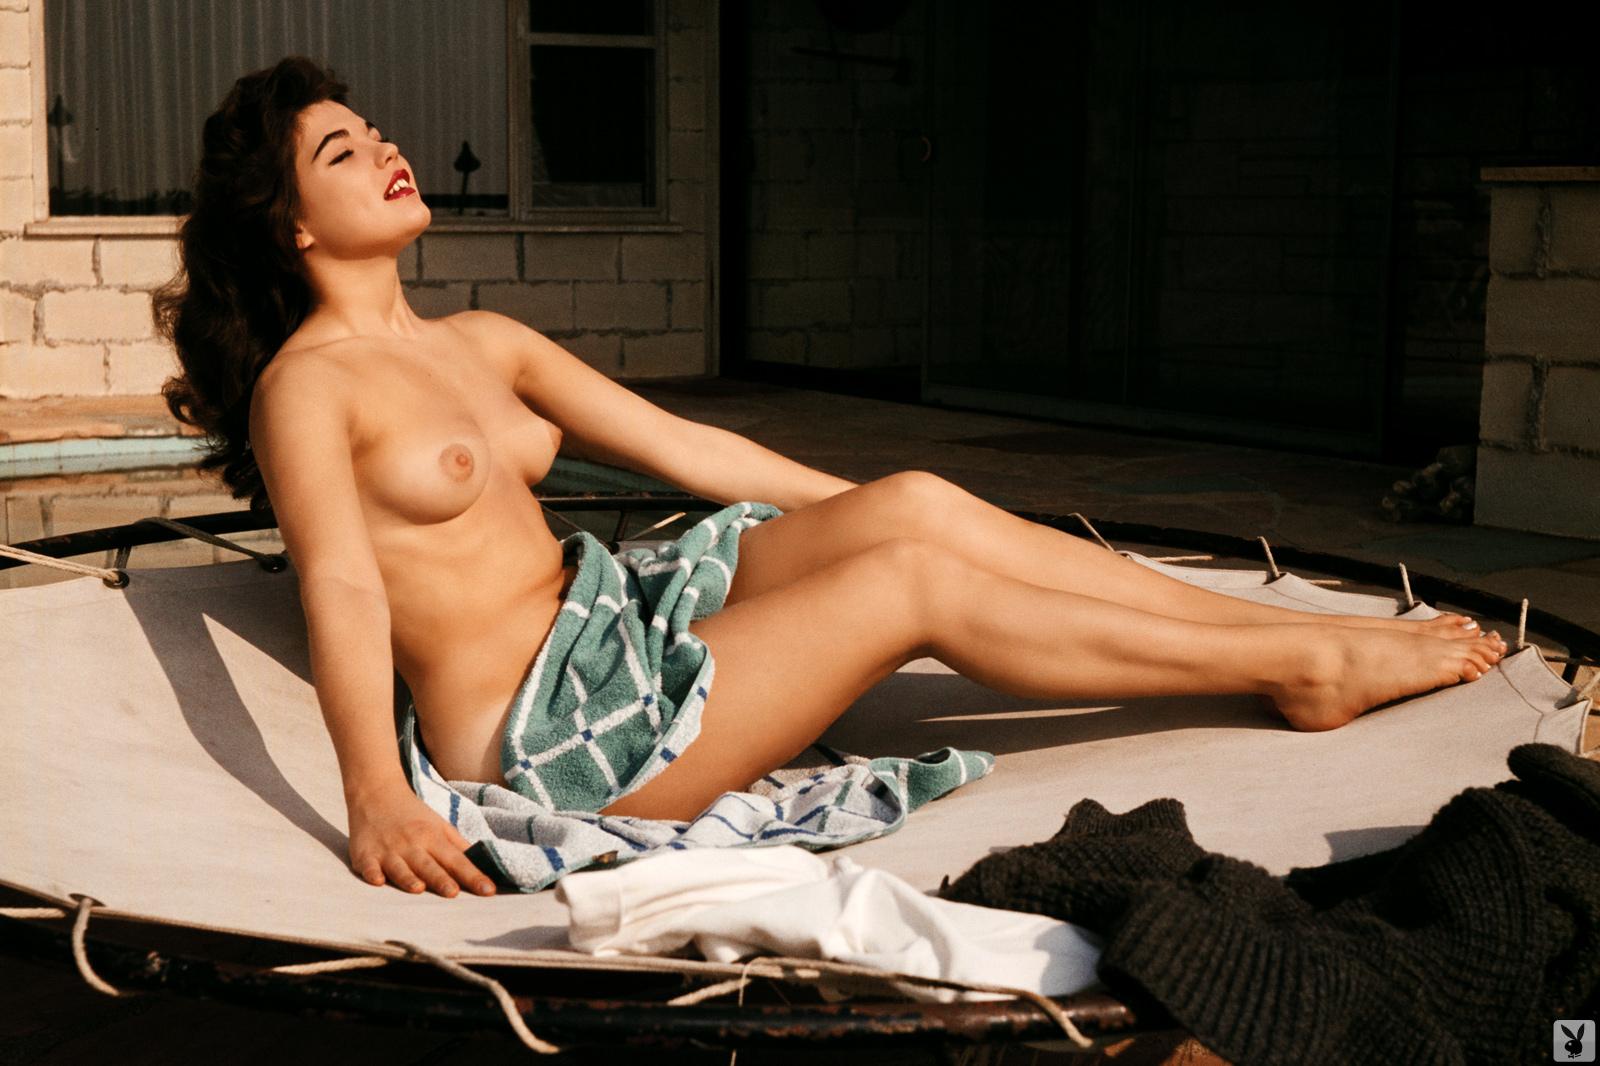 I Love Pics: Playmate Calendario 1965 Playboy Vintage